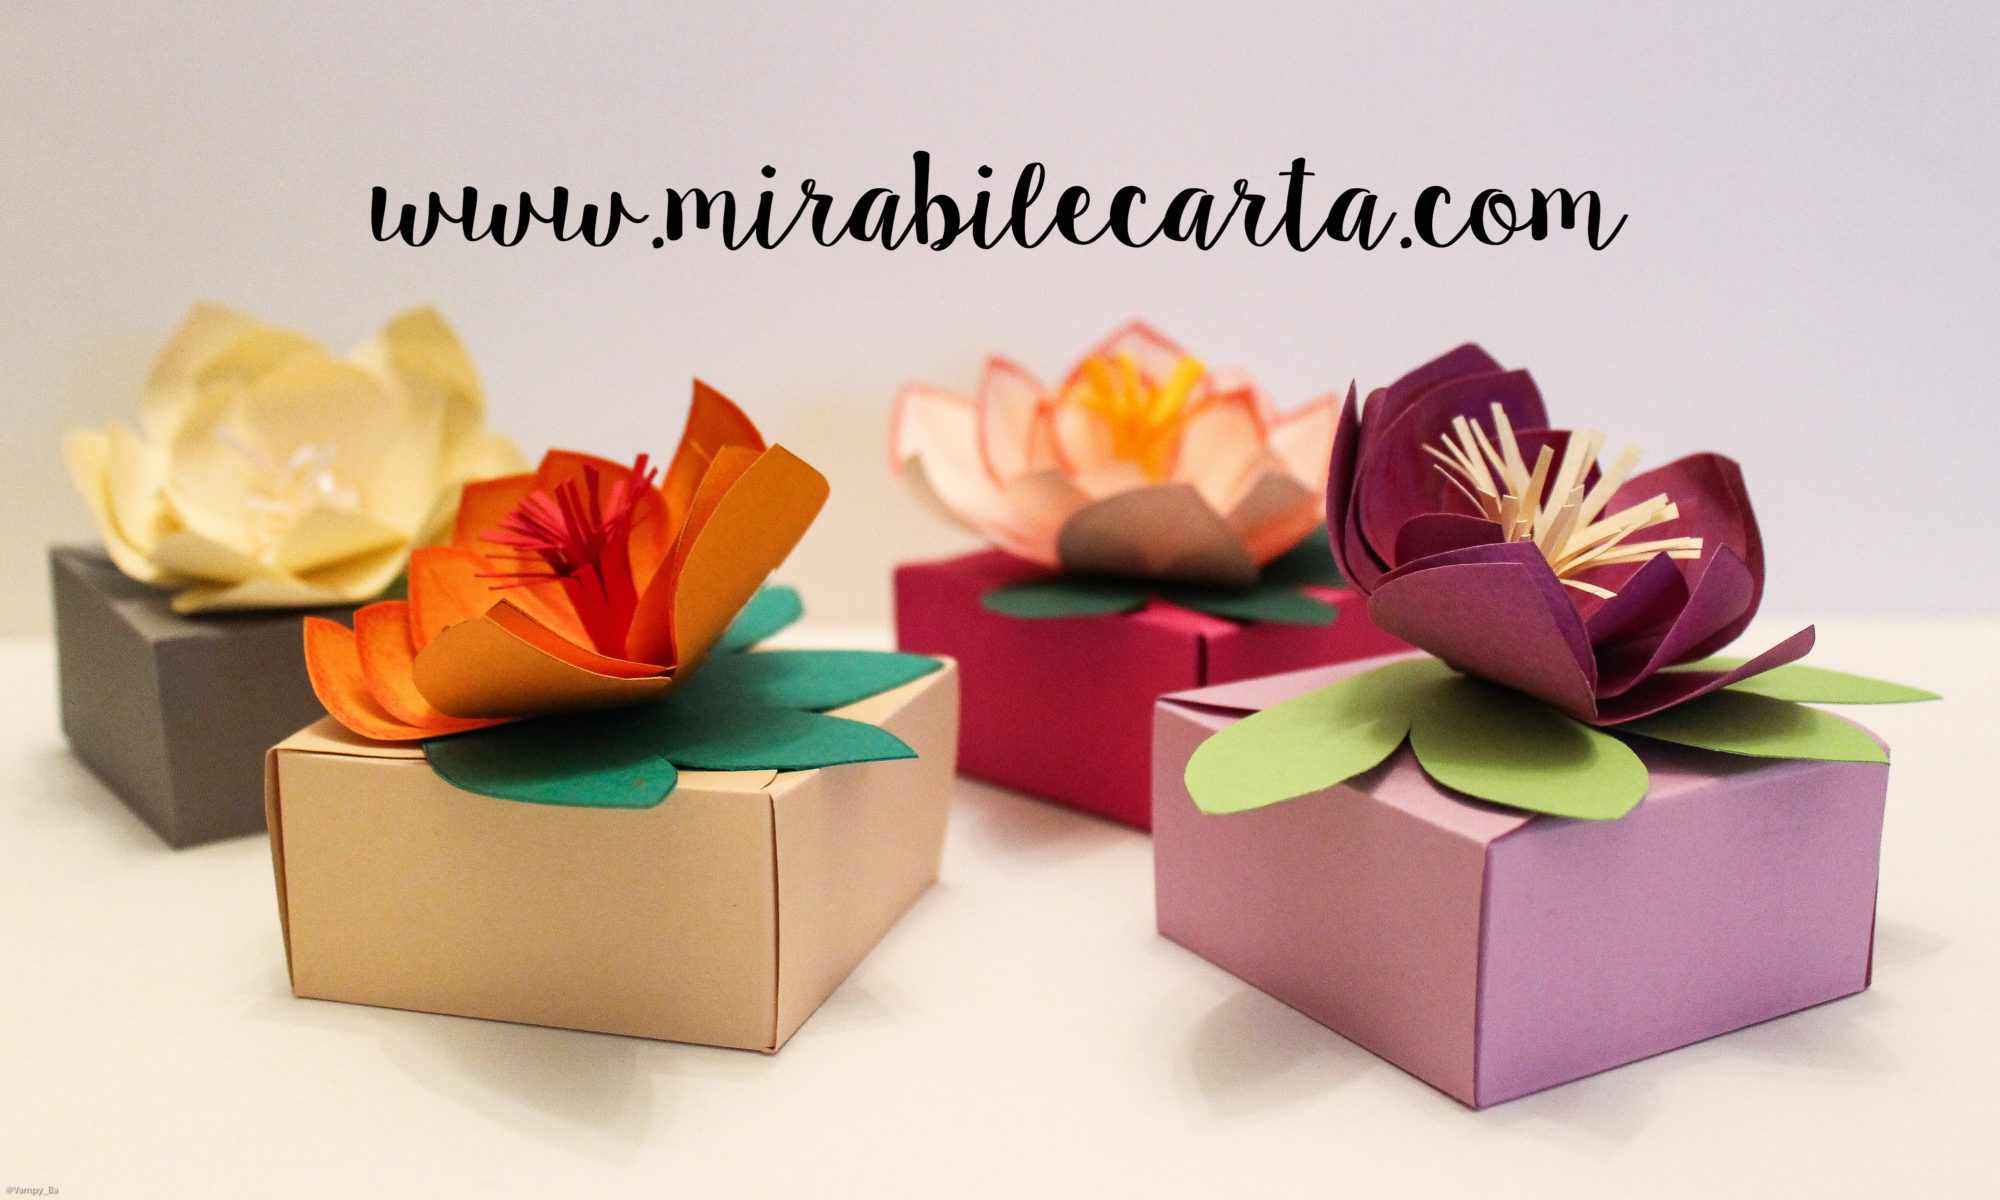 MIRABILE CARTA